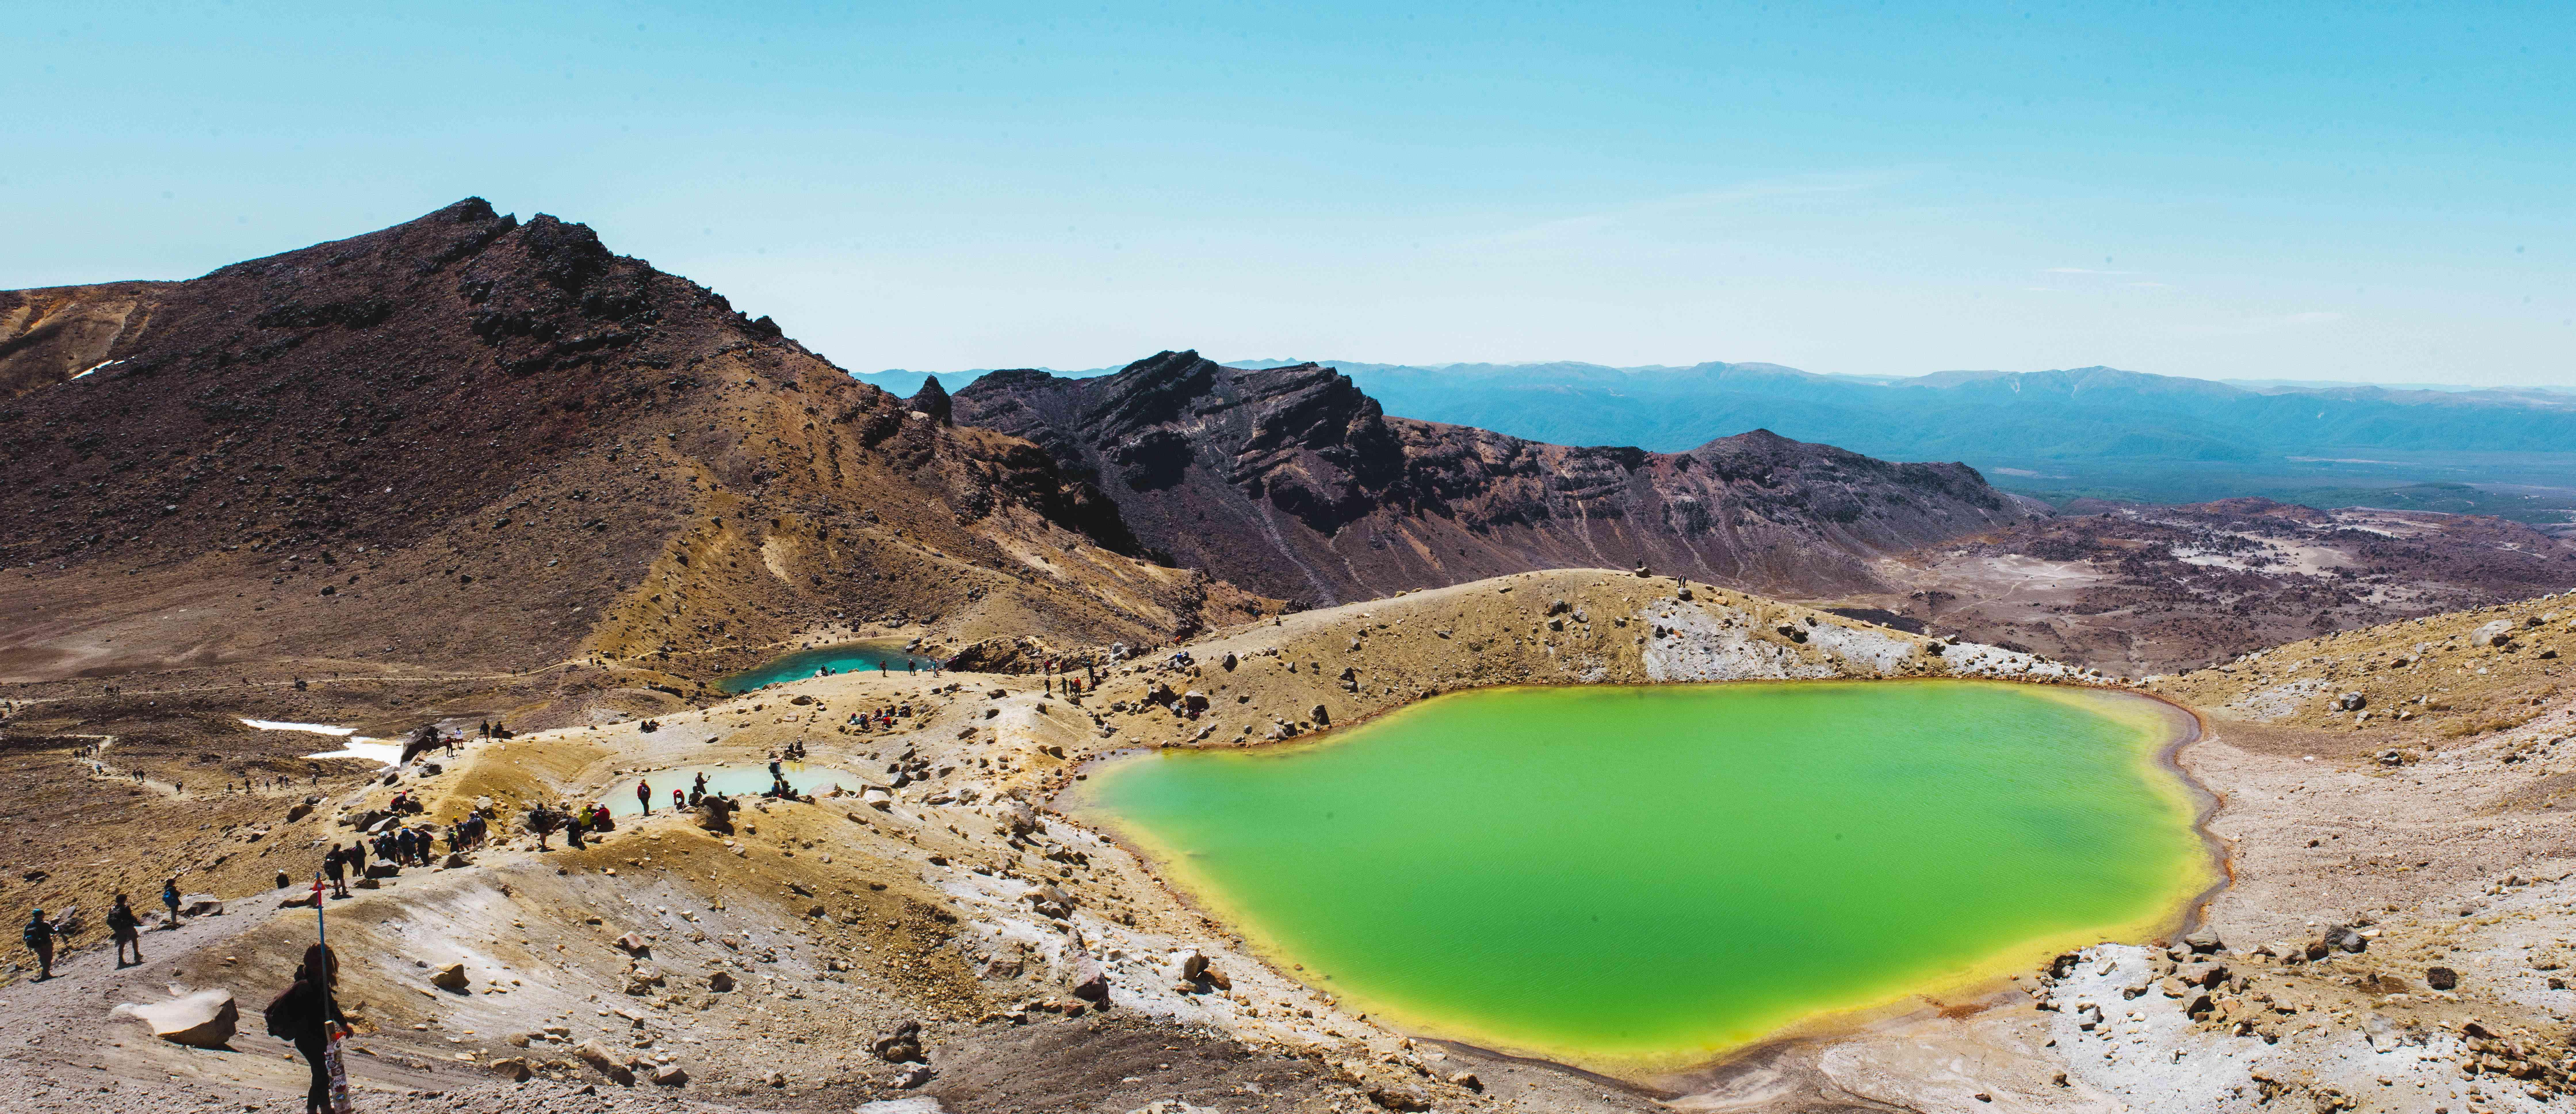 Piscinas de agua de colores brillantes en Tongariro